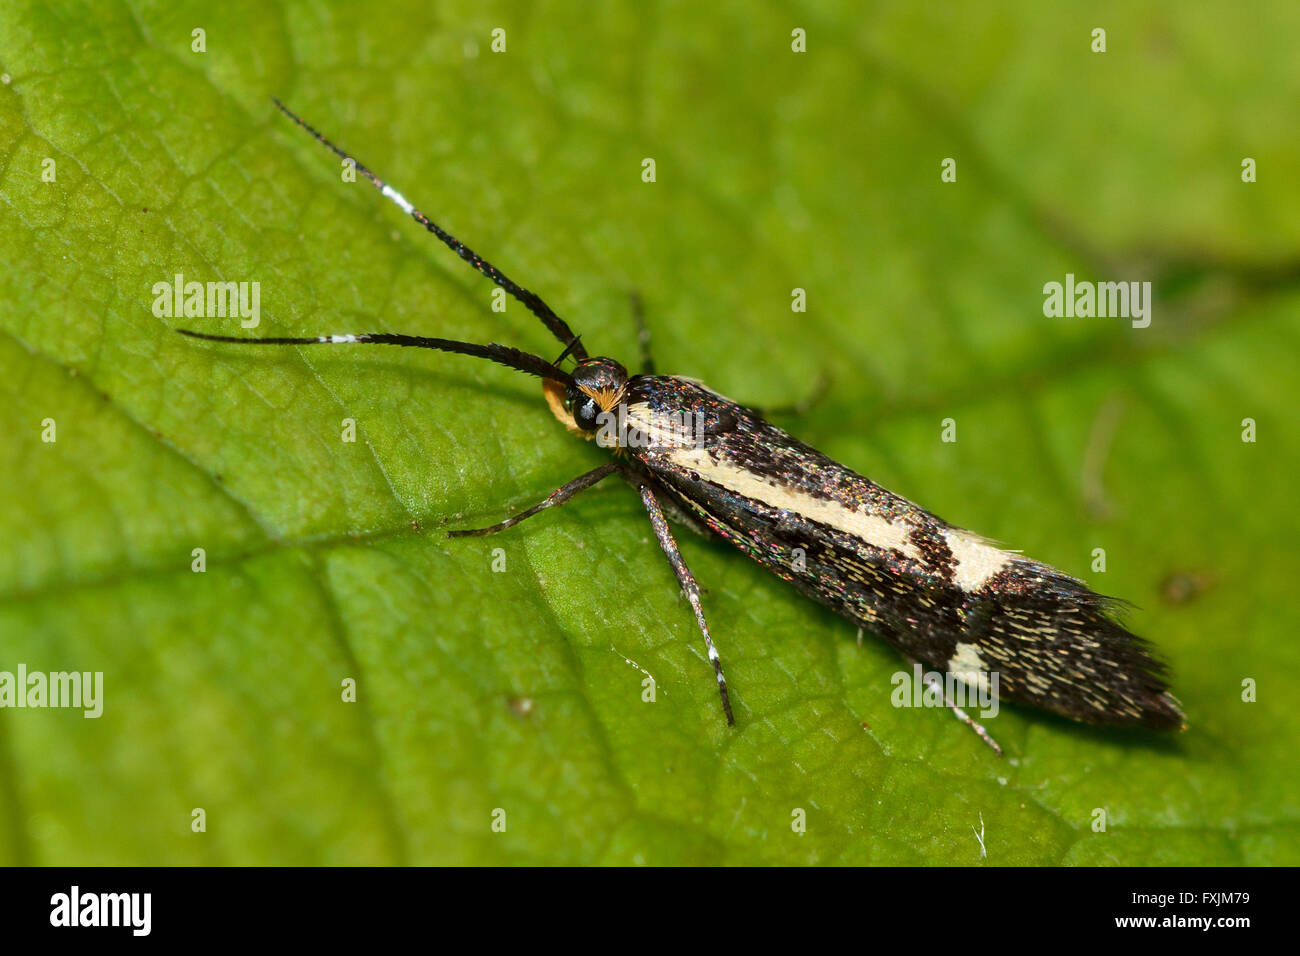 Esperia sulphurella micro moth. Tiny brown moth with yellow markings, in the family Oecophoridae - Stock Image